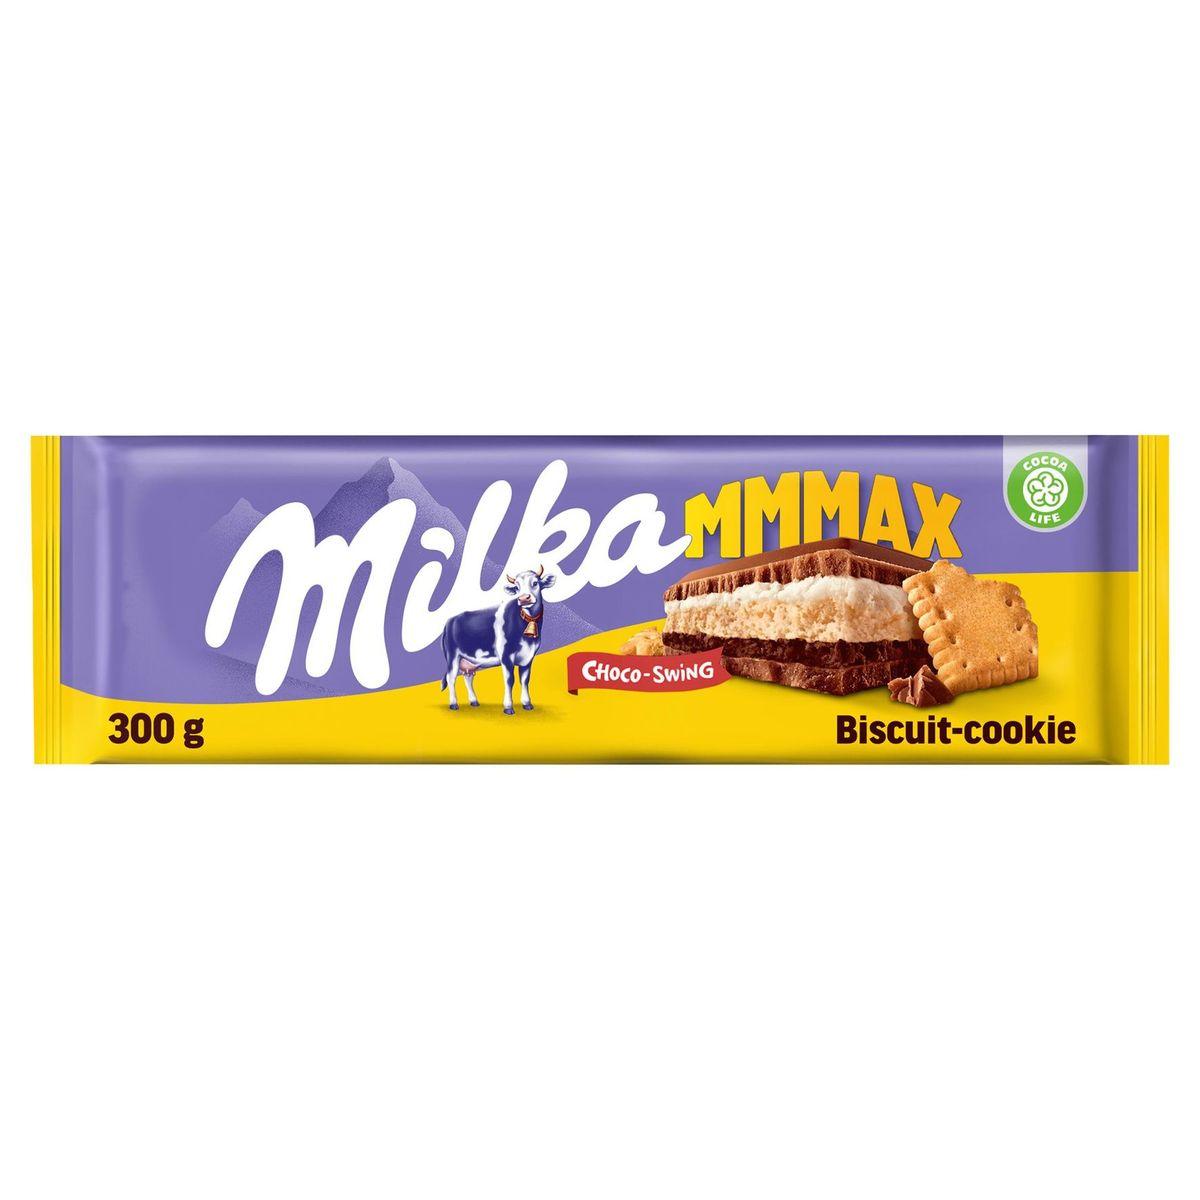 Milka Mmmax Choco-Swing Biscuit-Galleta 300 g